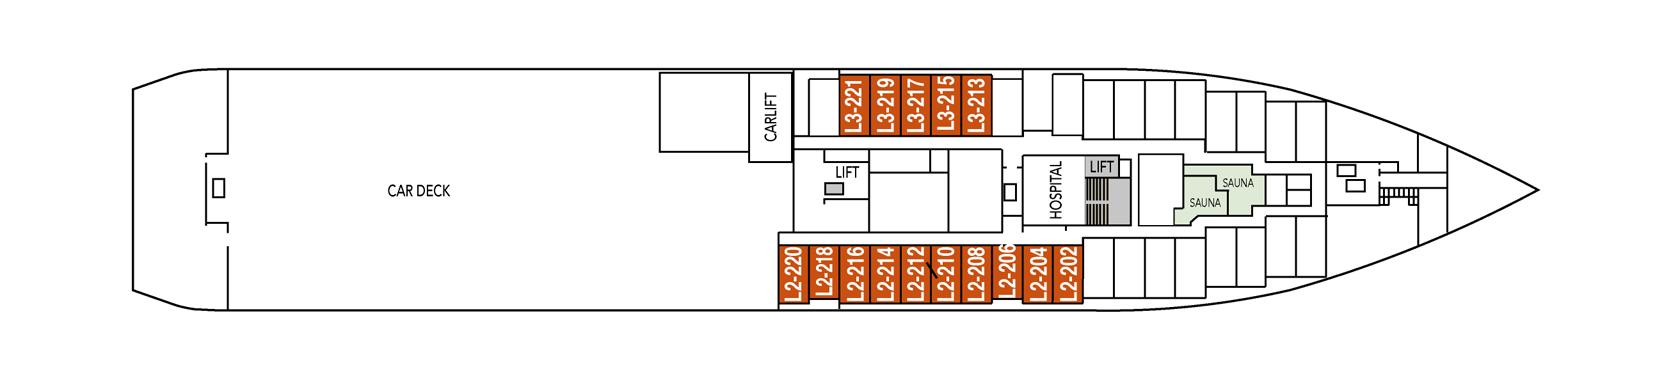 Hurtigruten MS Kong Harald Deck Plans Deck 2.png